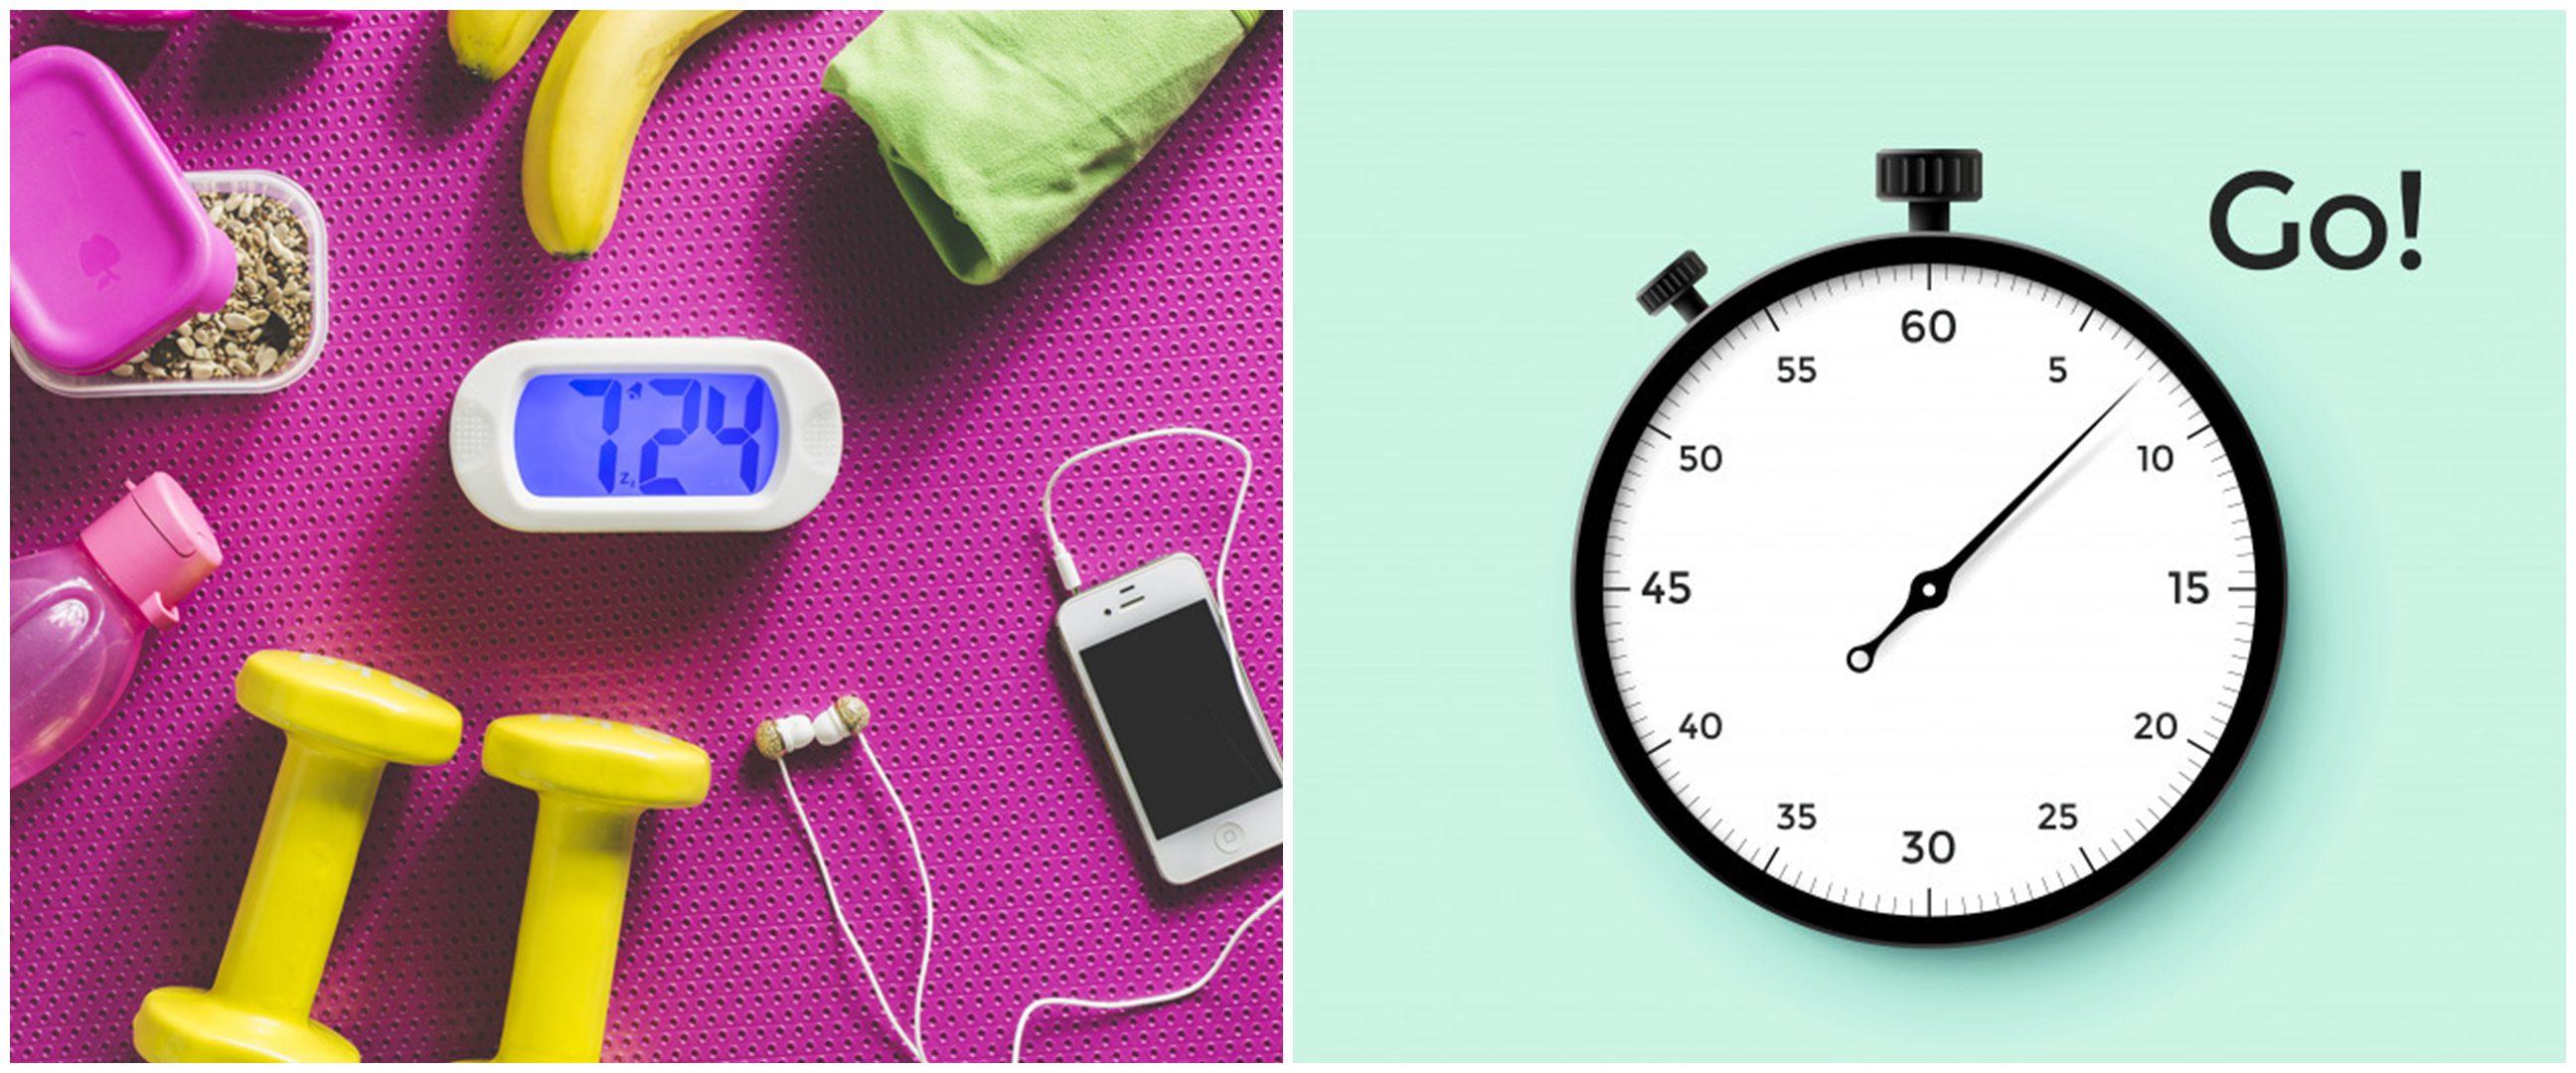 9 Aplikasi Android untuk olahraga, bantu jaga kesehatan